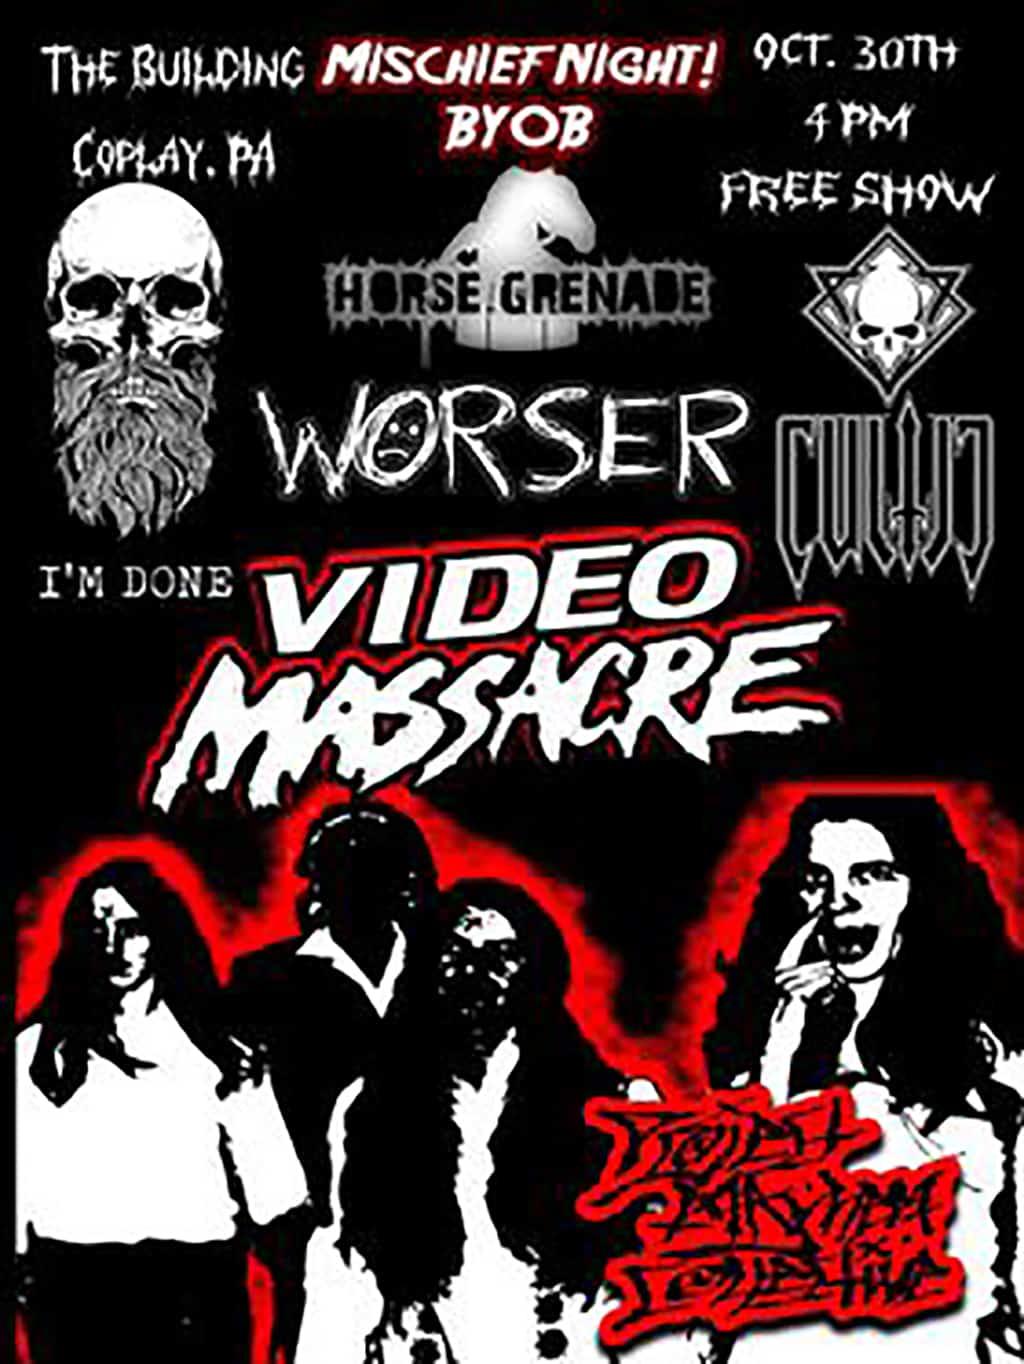 Cultic, Video Massacre, Worser, I'm Done, Horse Grenade - Oct. 31, 2021 Show Flyer